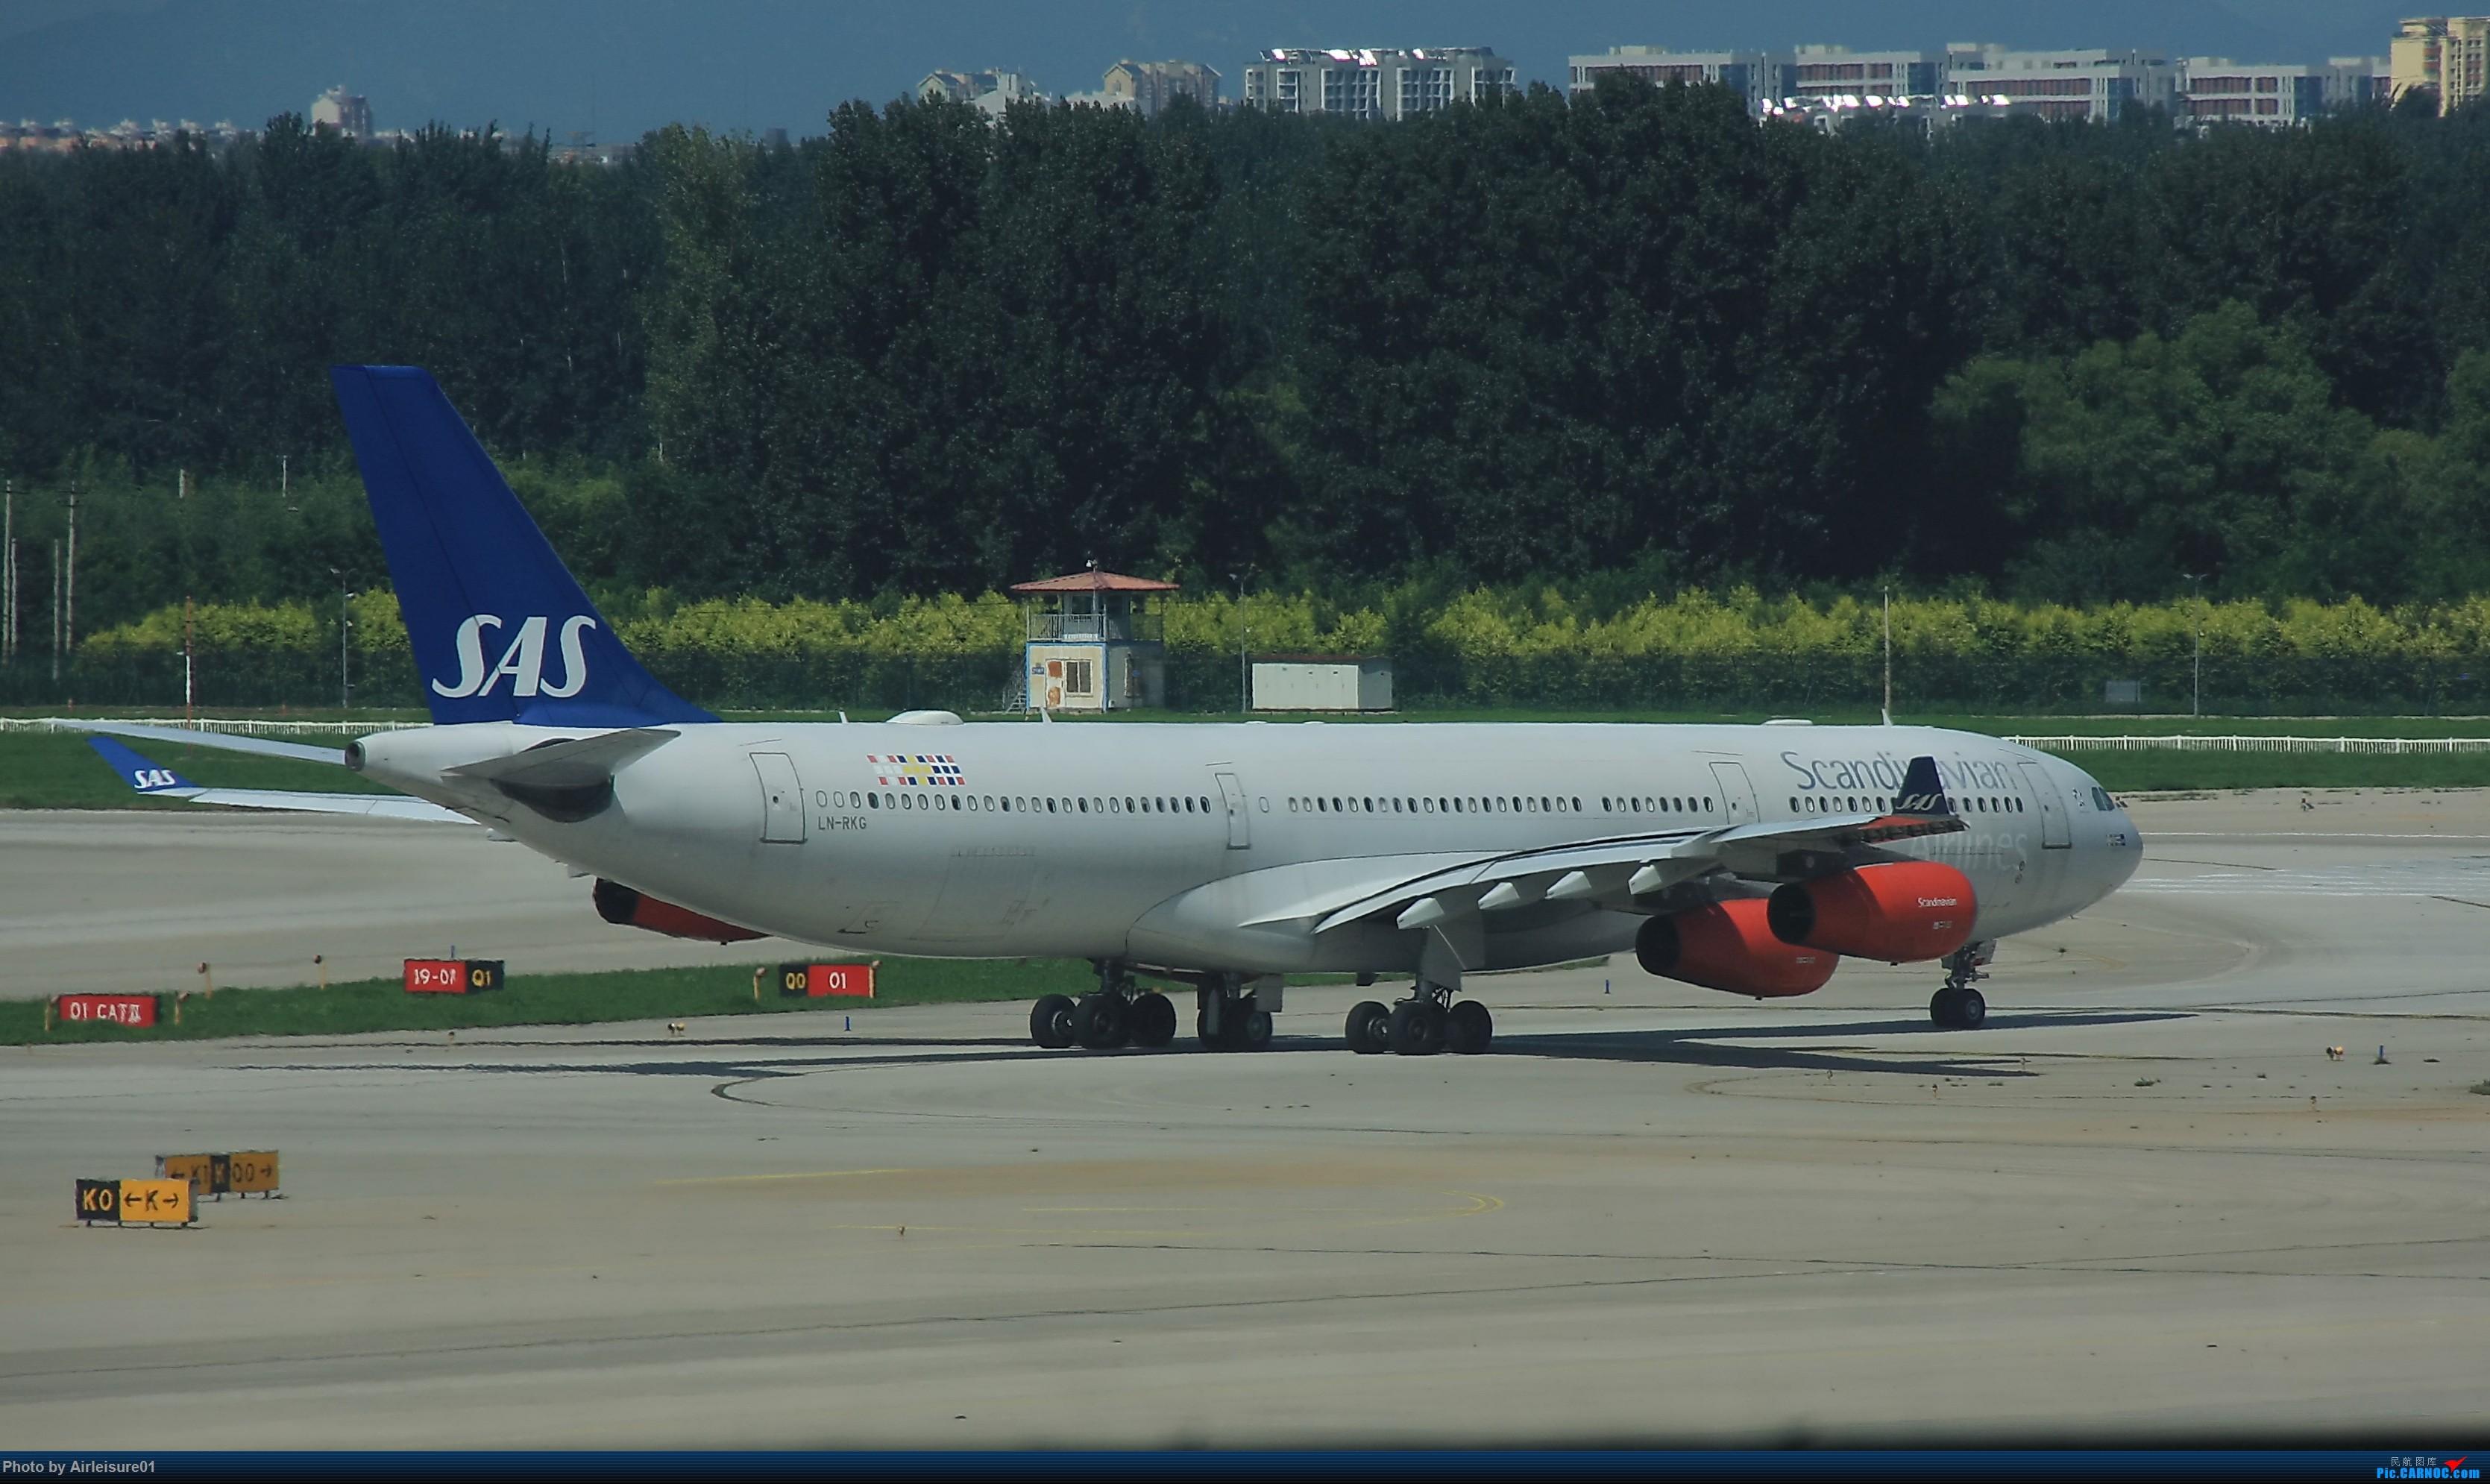 Re:[原创]新人首发。。请大神们多多指导 A340-300 LN-RKG 中国北京首都国际机场